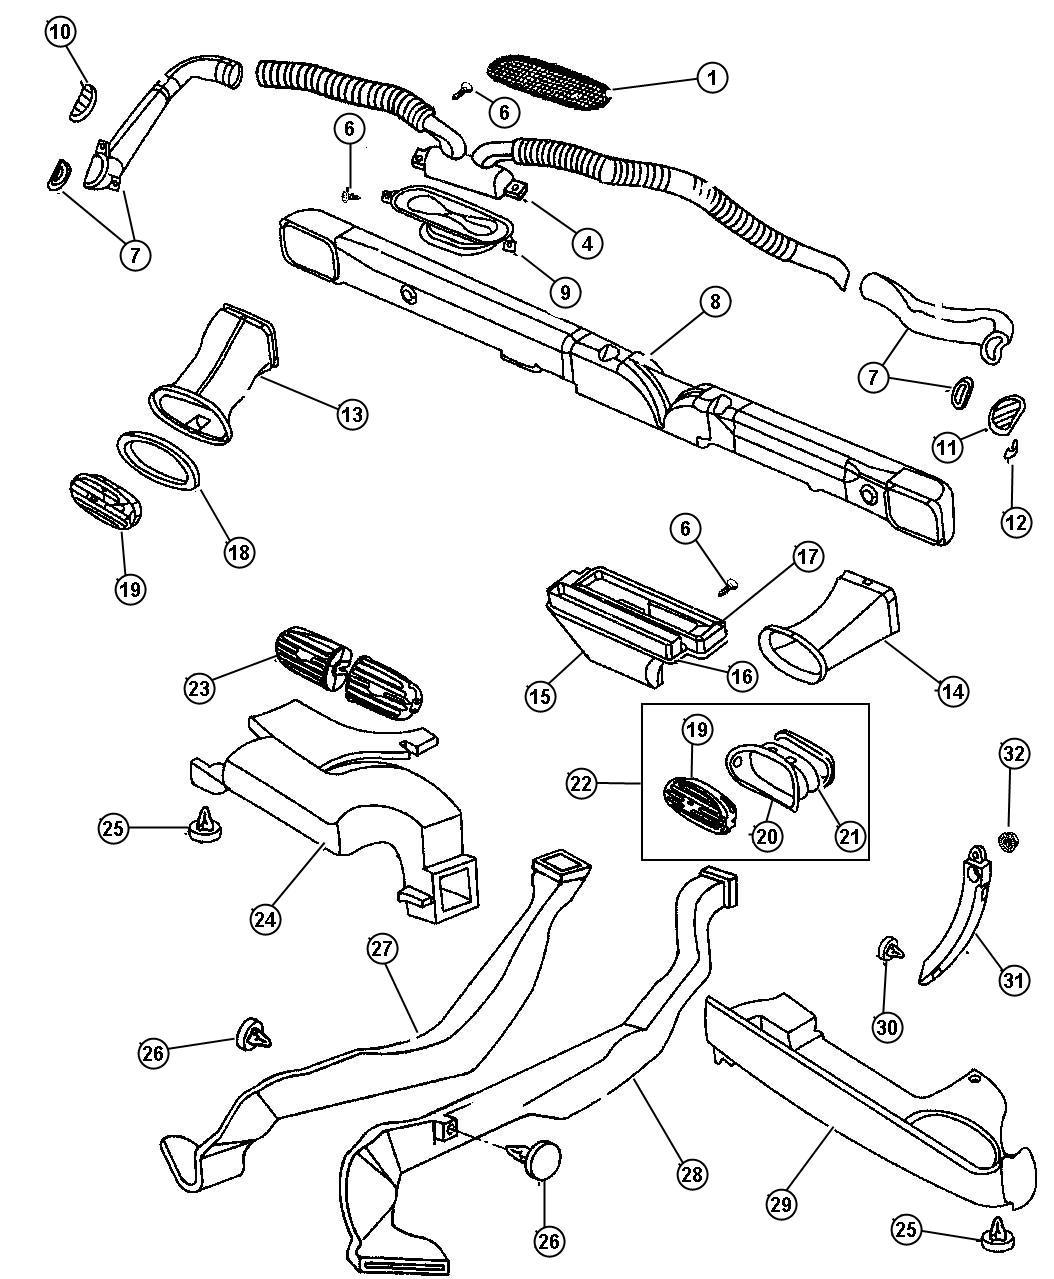 Dodge Stratus Reinforcement. Instrument panel. Cross car